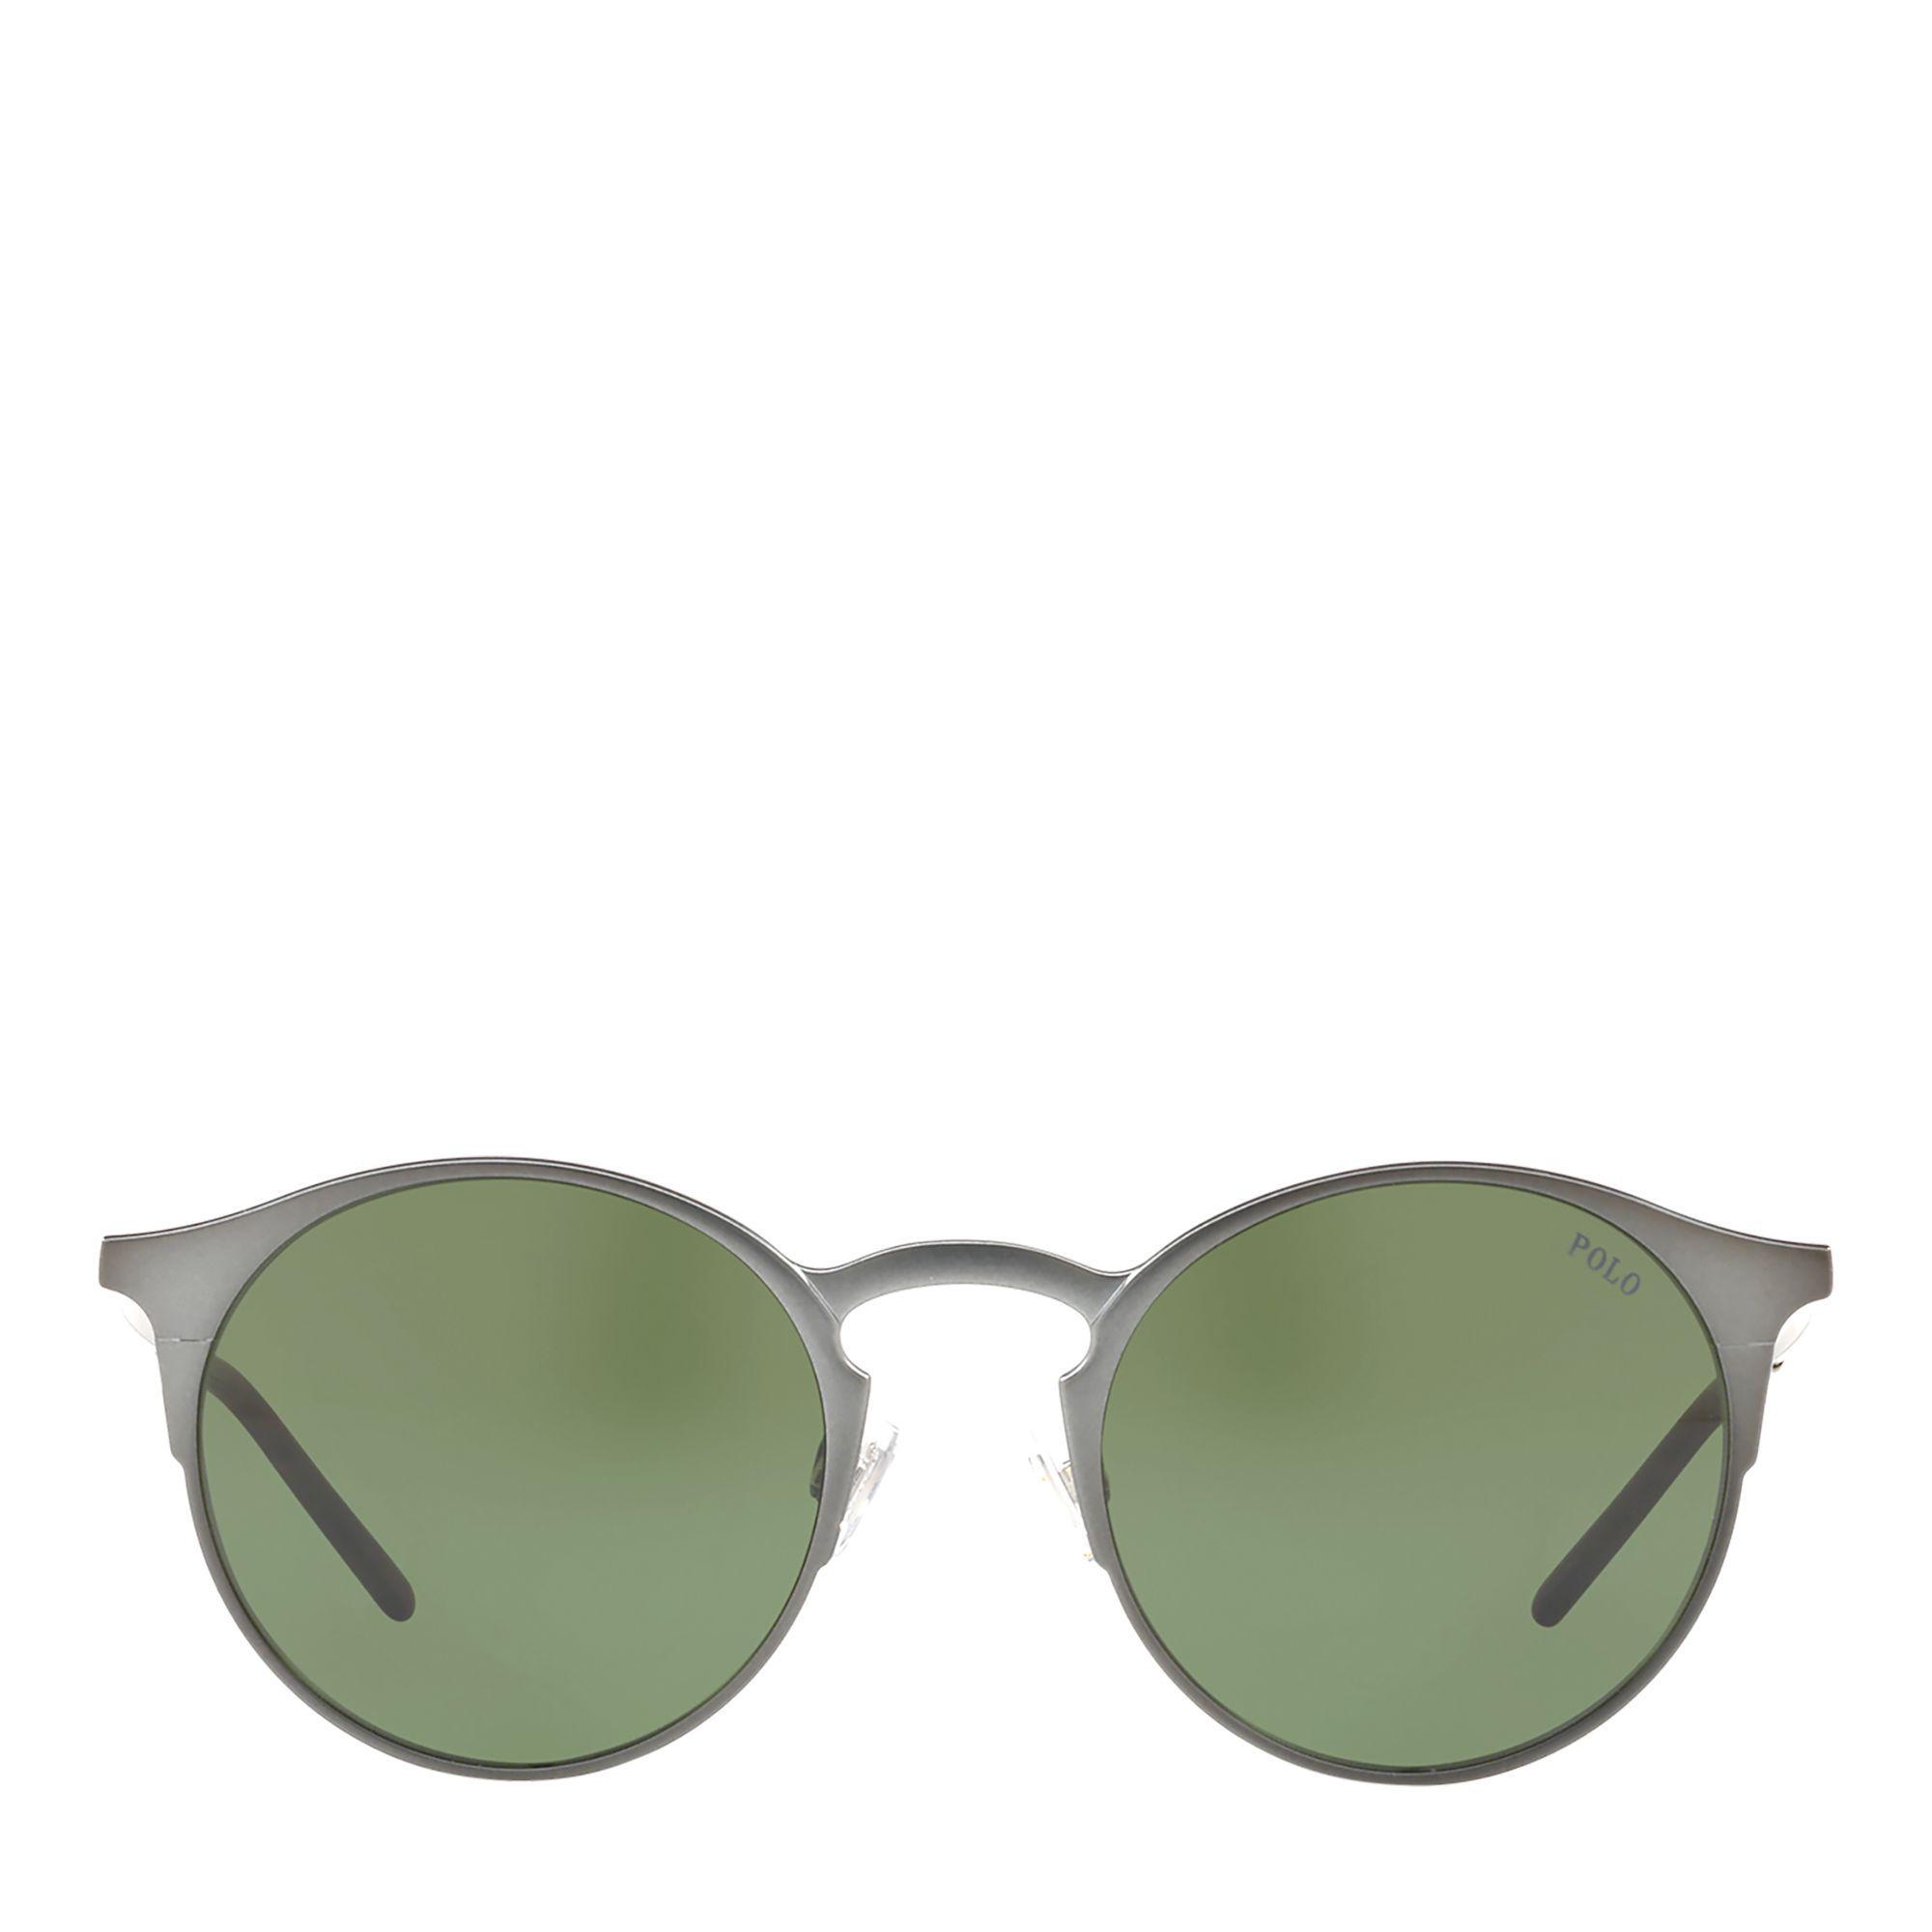 ca802ed5c Polo Ralph Lauren Round Metal Sunglasses in Green for Men - Lyst